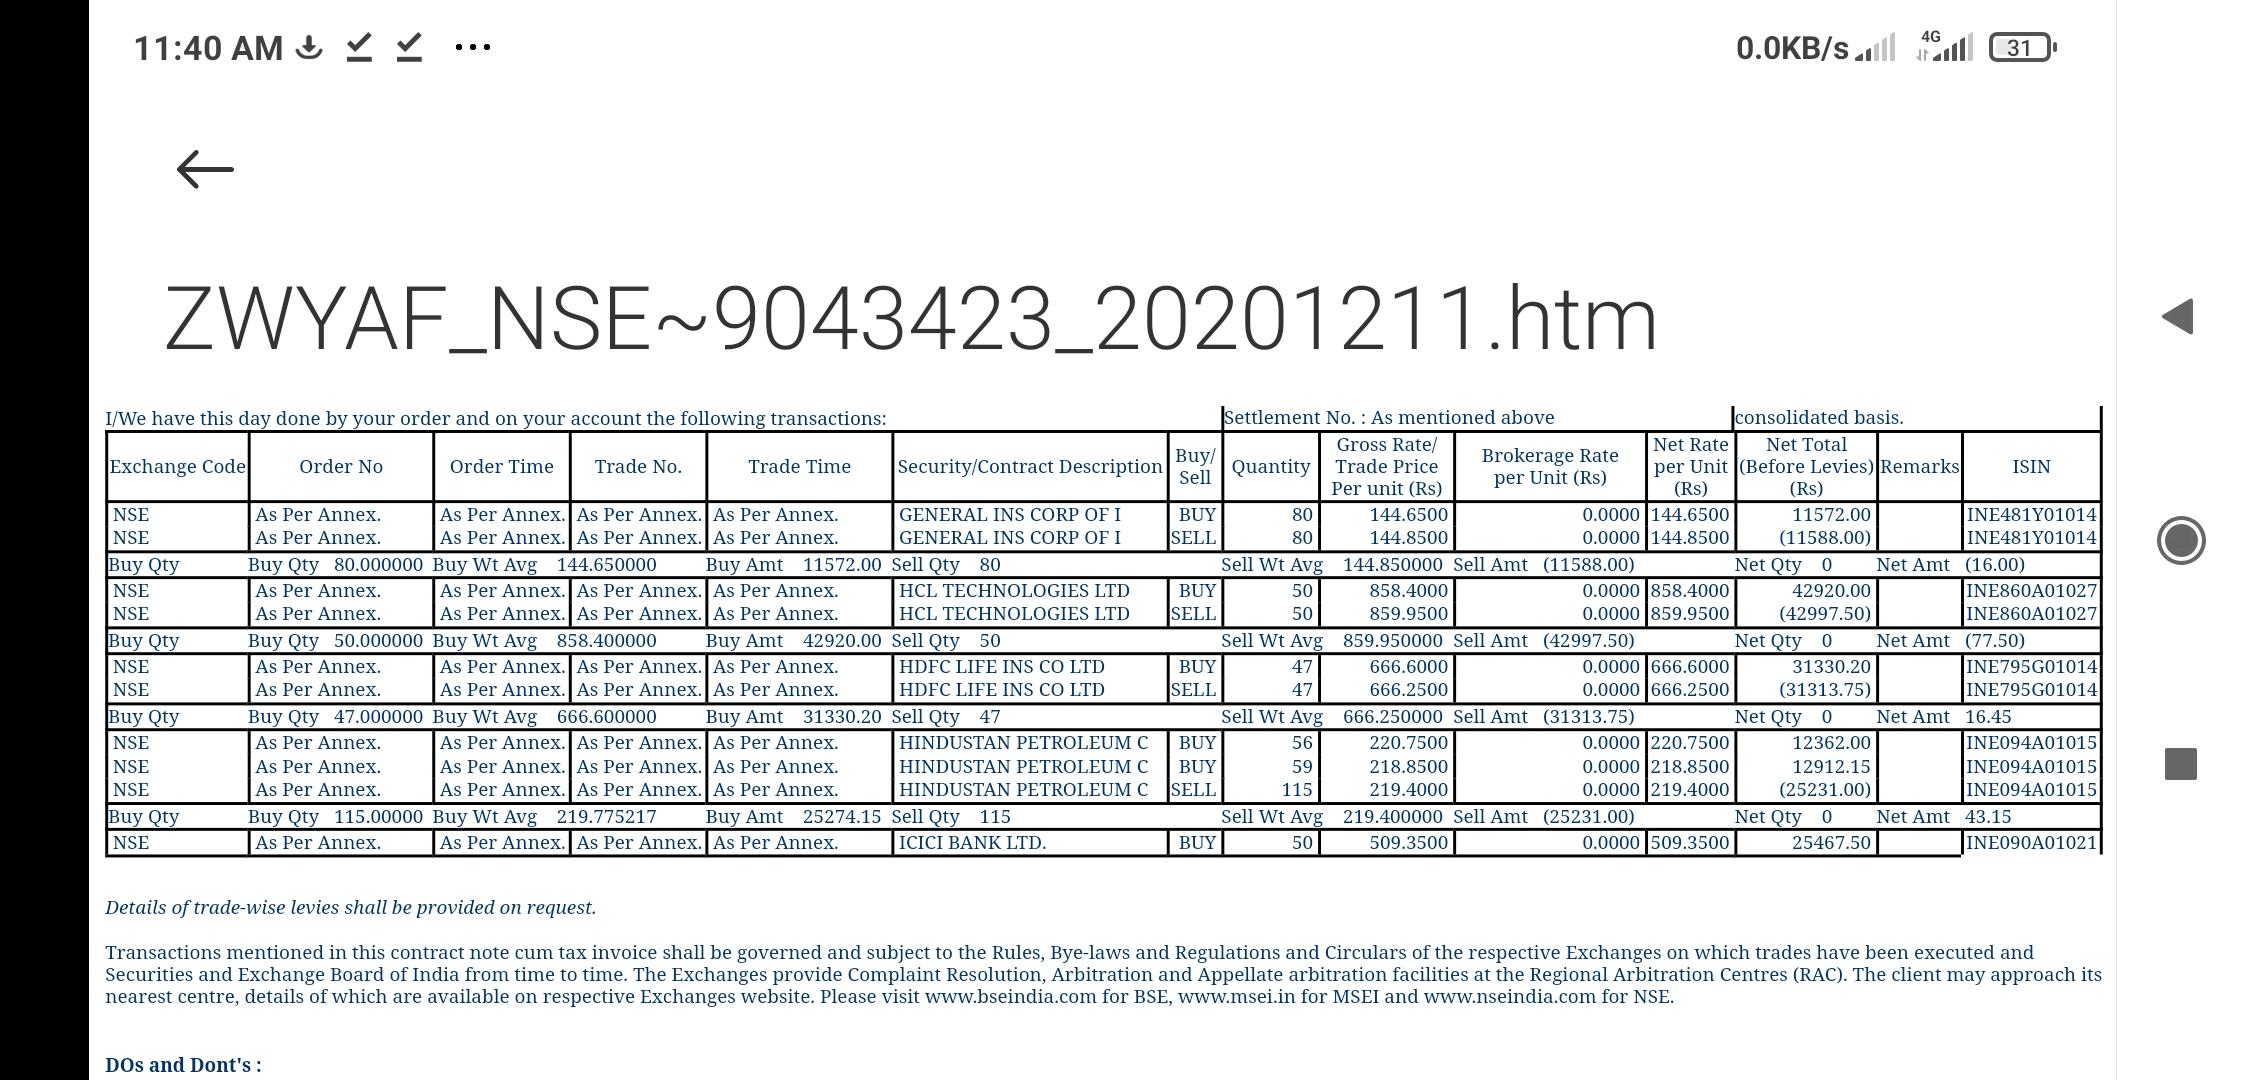 Screenshot_2020-12-12-11-40-08-365_com.android.htmlviewer.jpg